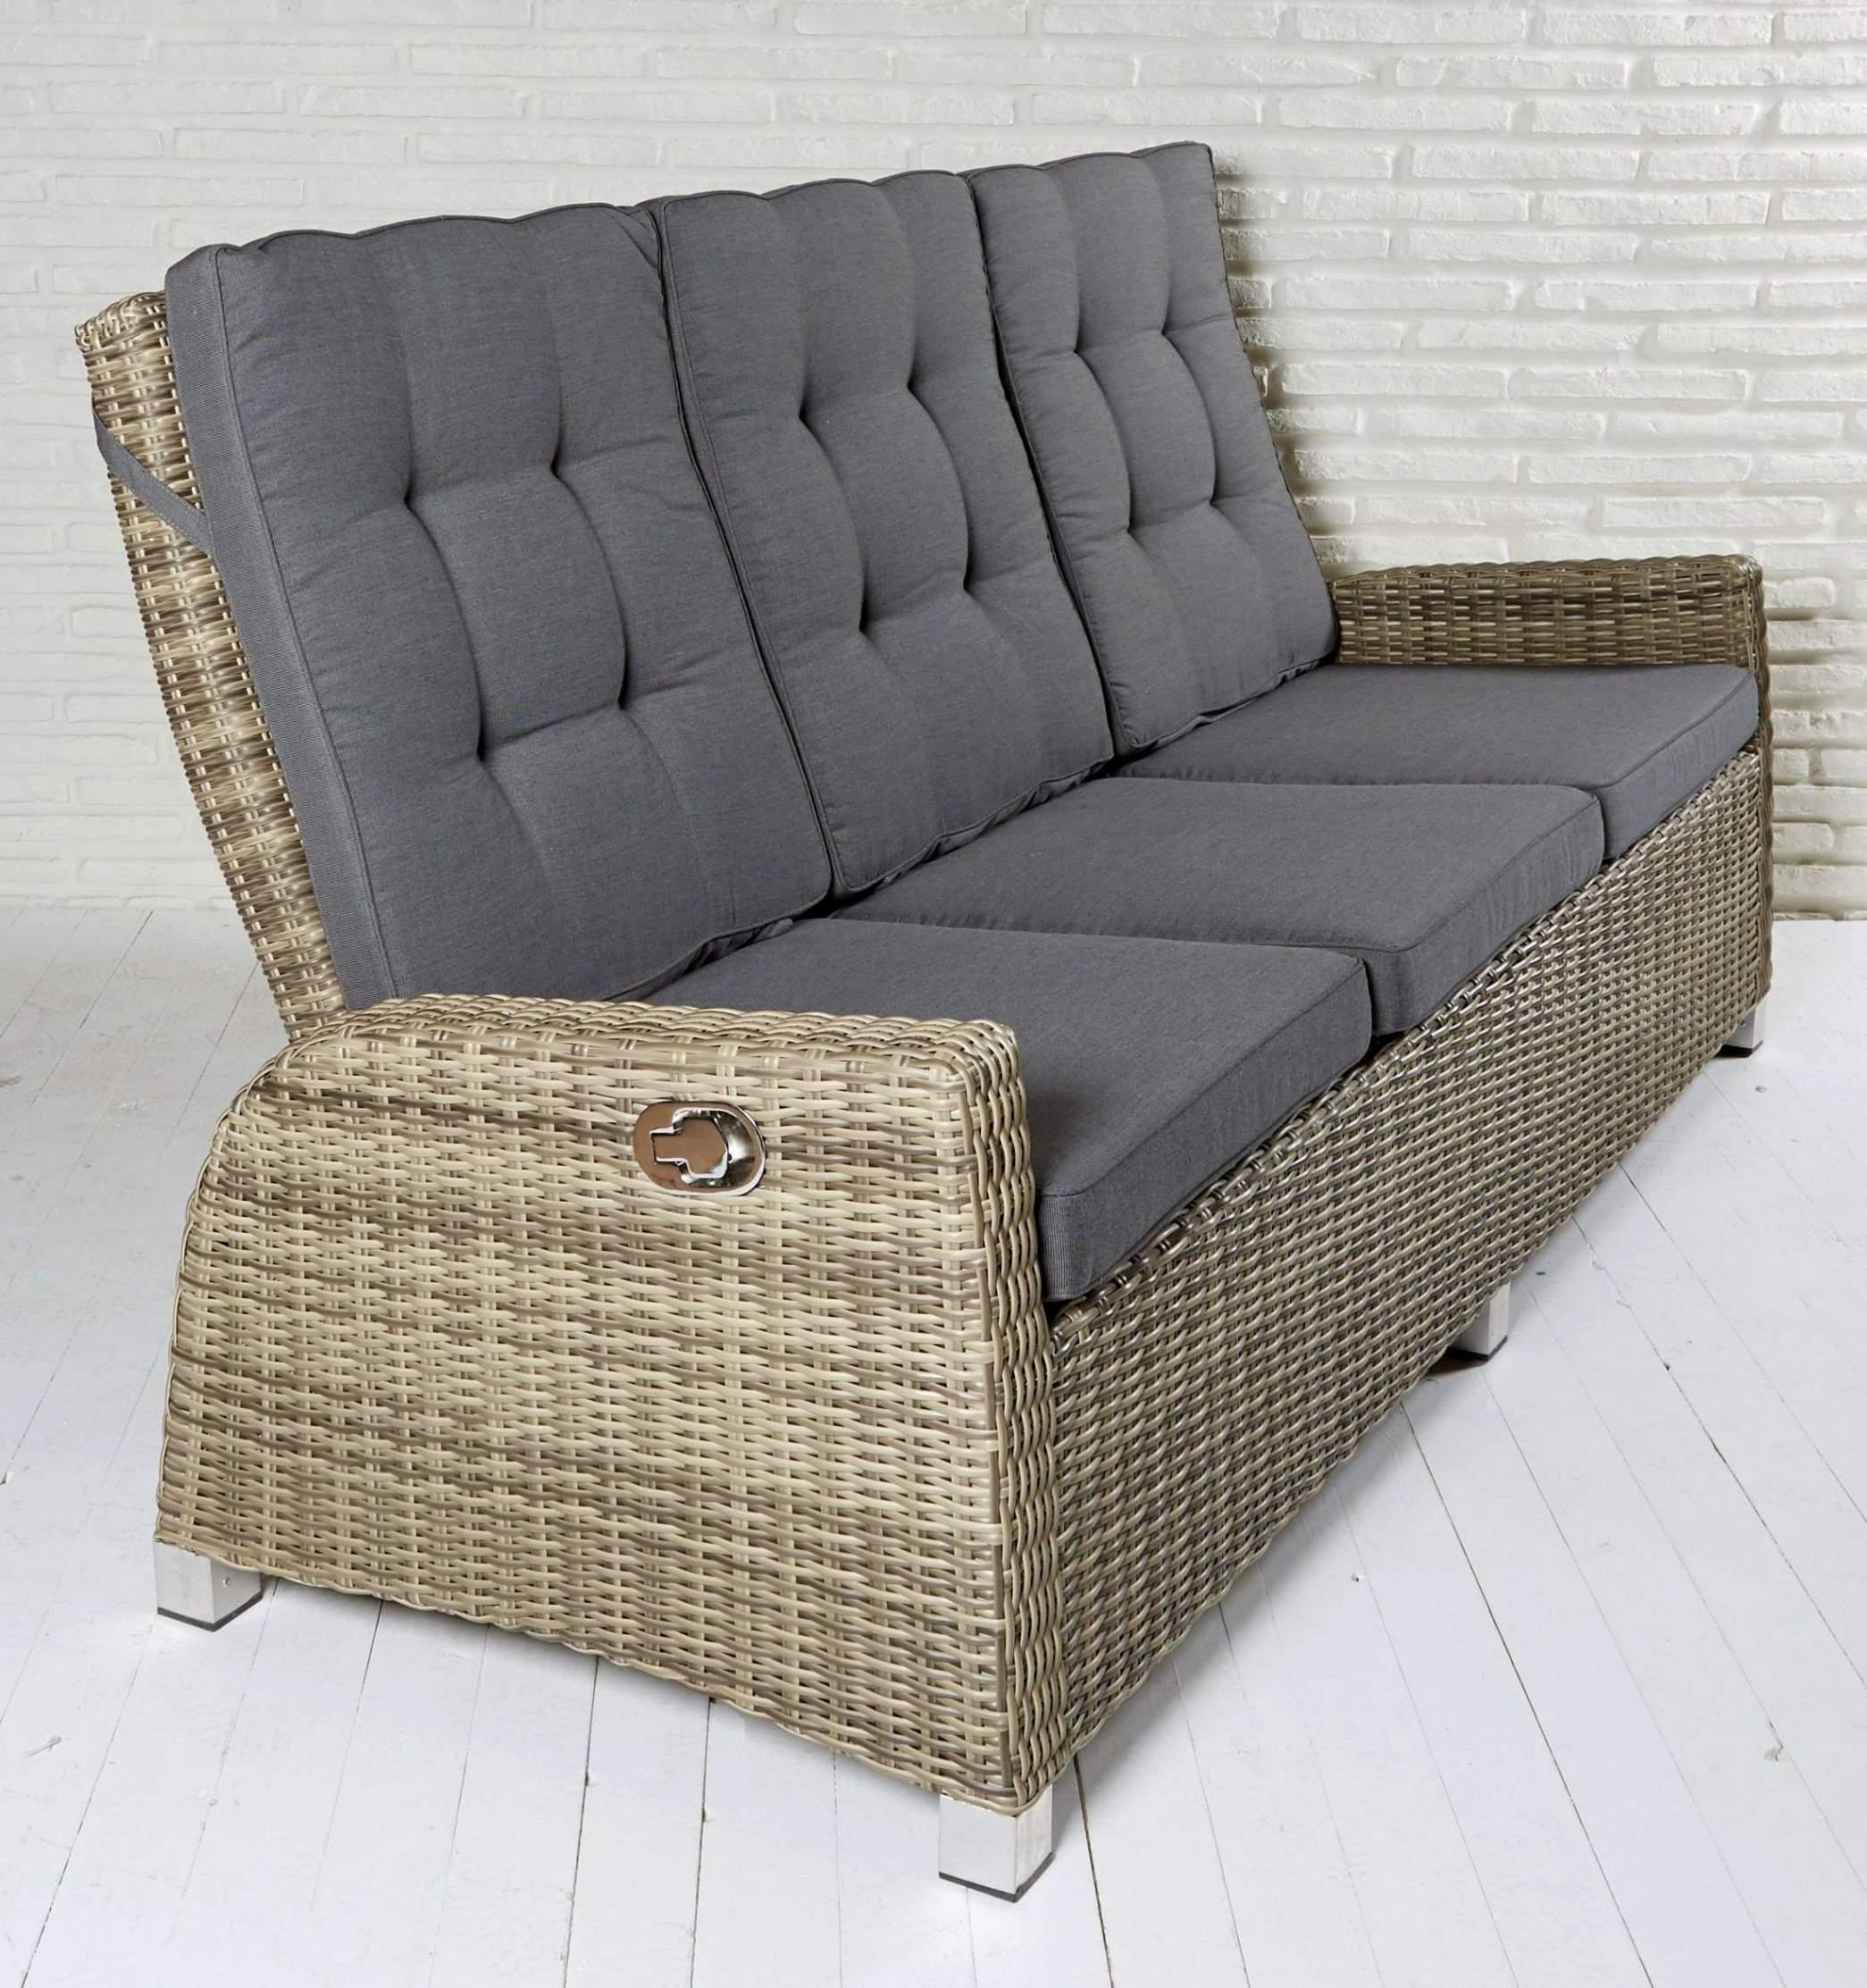 45 inspirierend paletten sofa outdoor bilder outdoor lounge selber bauen outdoor lounge selber bauen 1